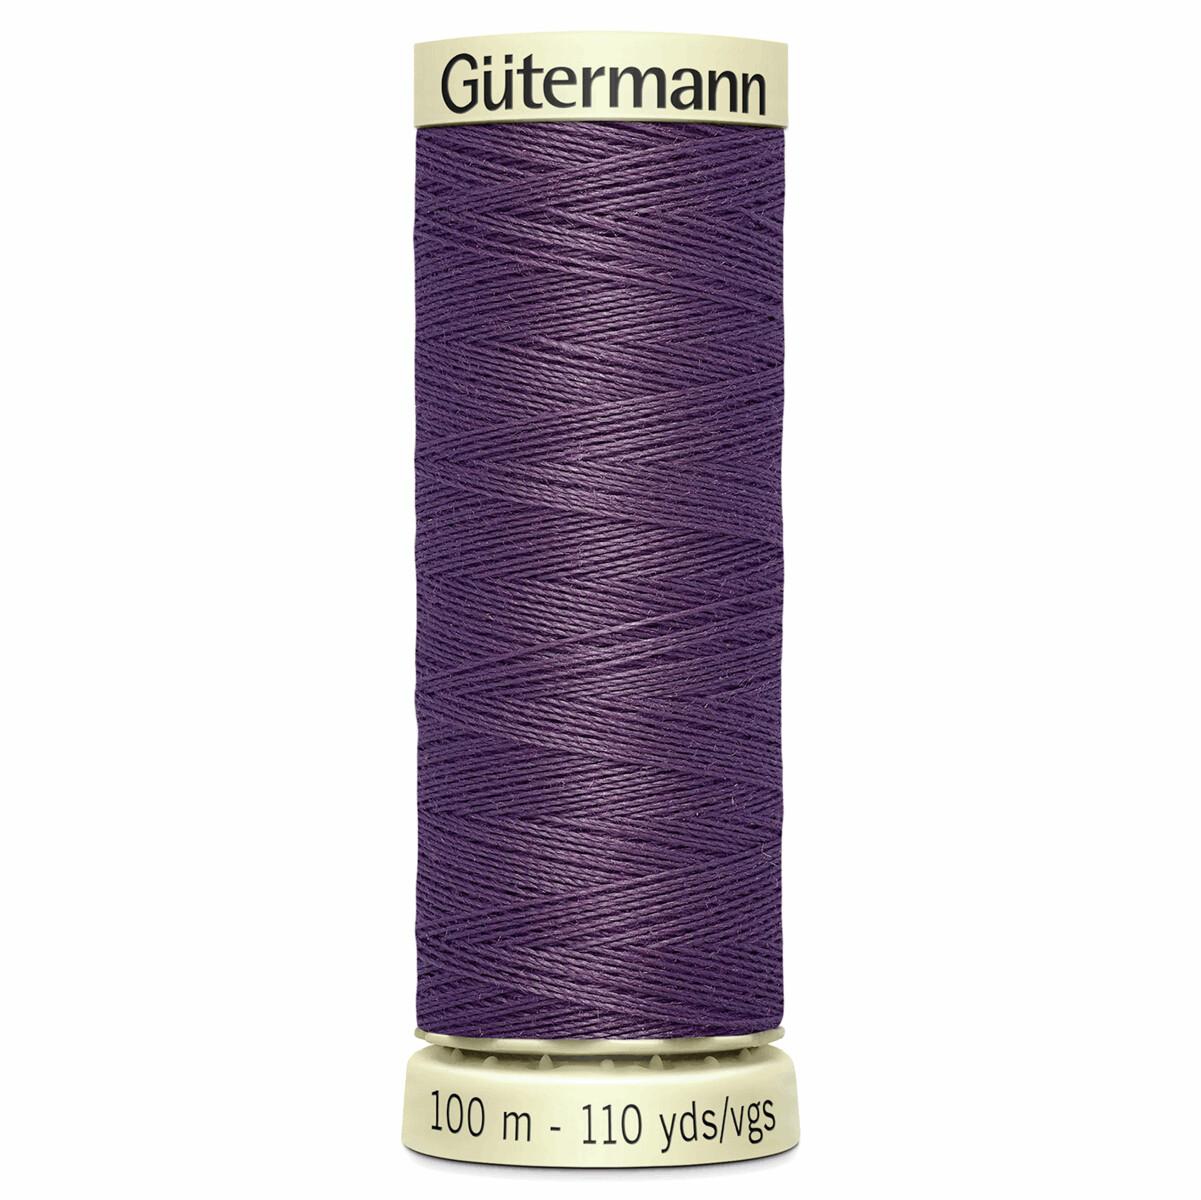 Gutermann Sew-All thread 128